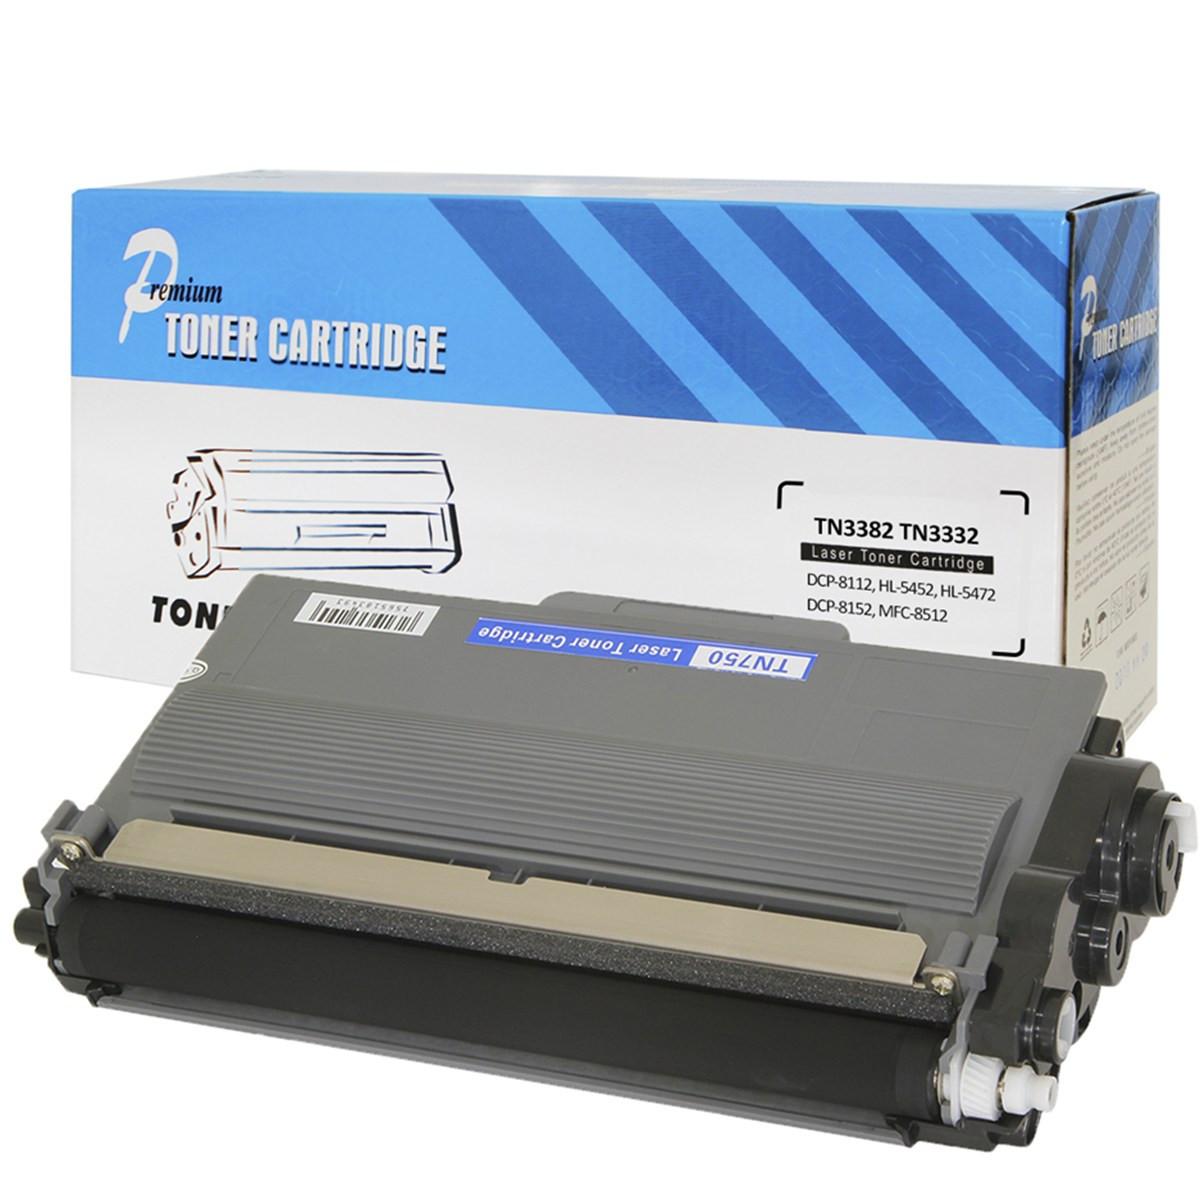 Toner Compativel Brother TN750/TN780